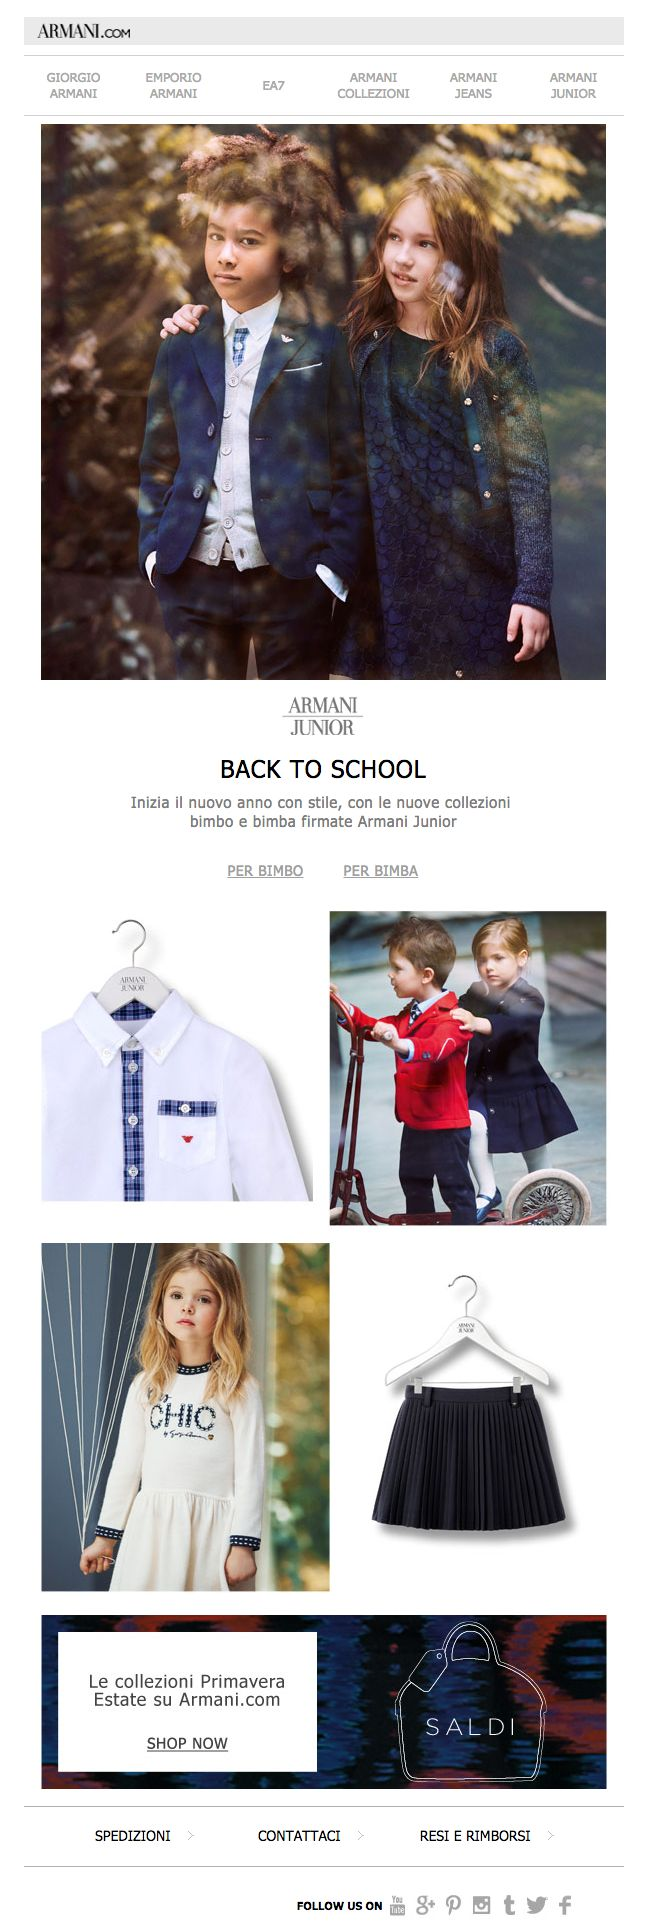 Armani Junior: back to school